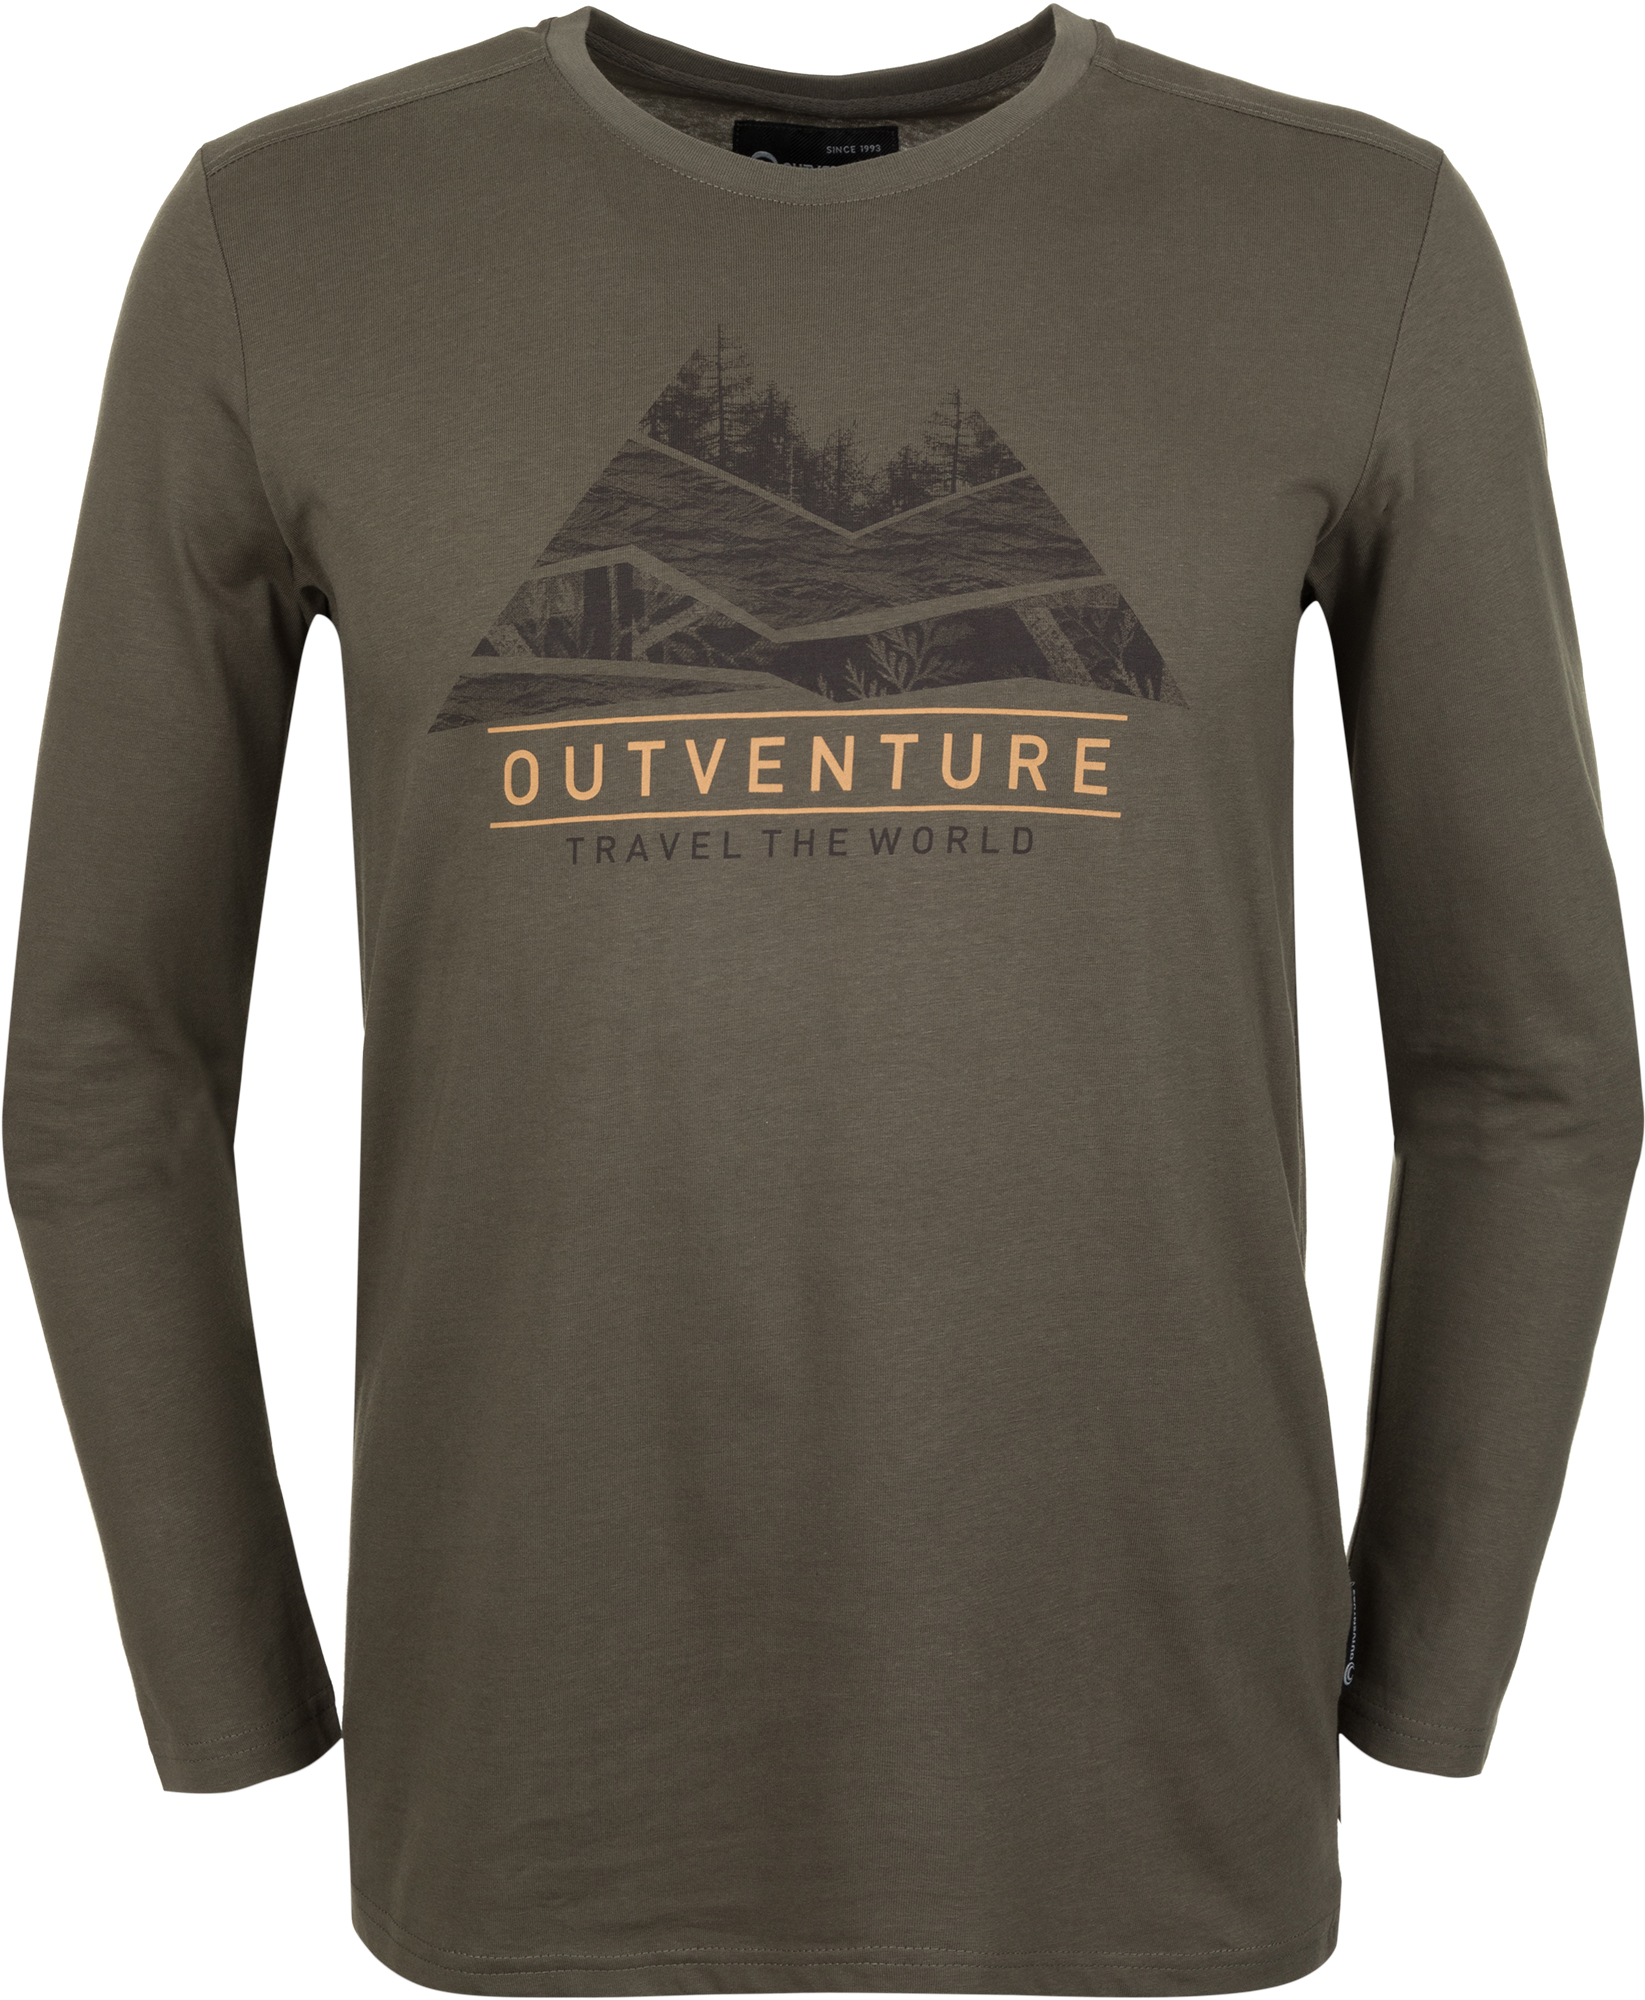 Outventure Футболка с длинным рукавом мужская Outventure, размер 58